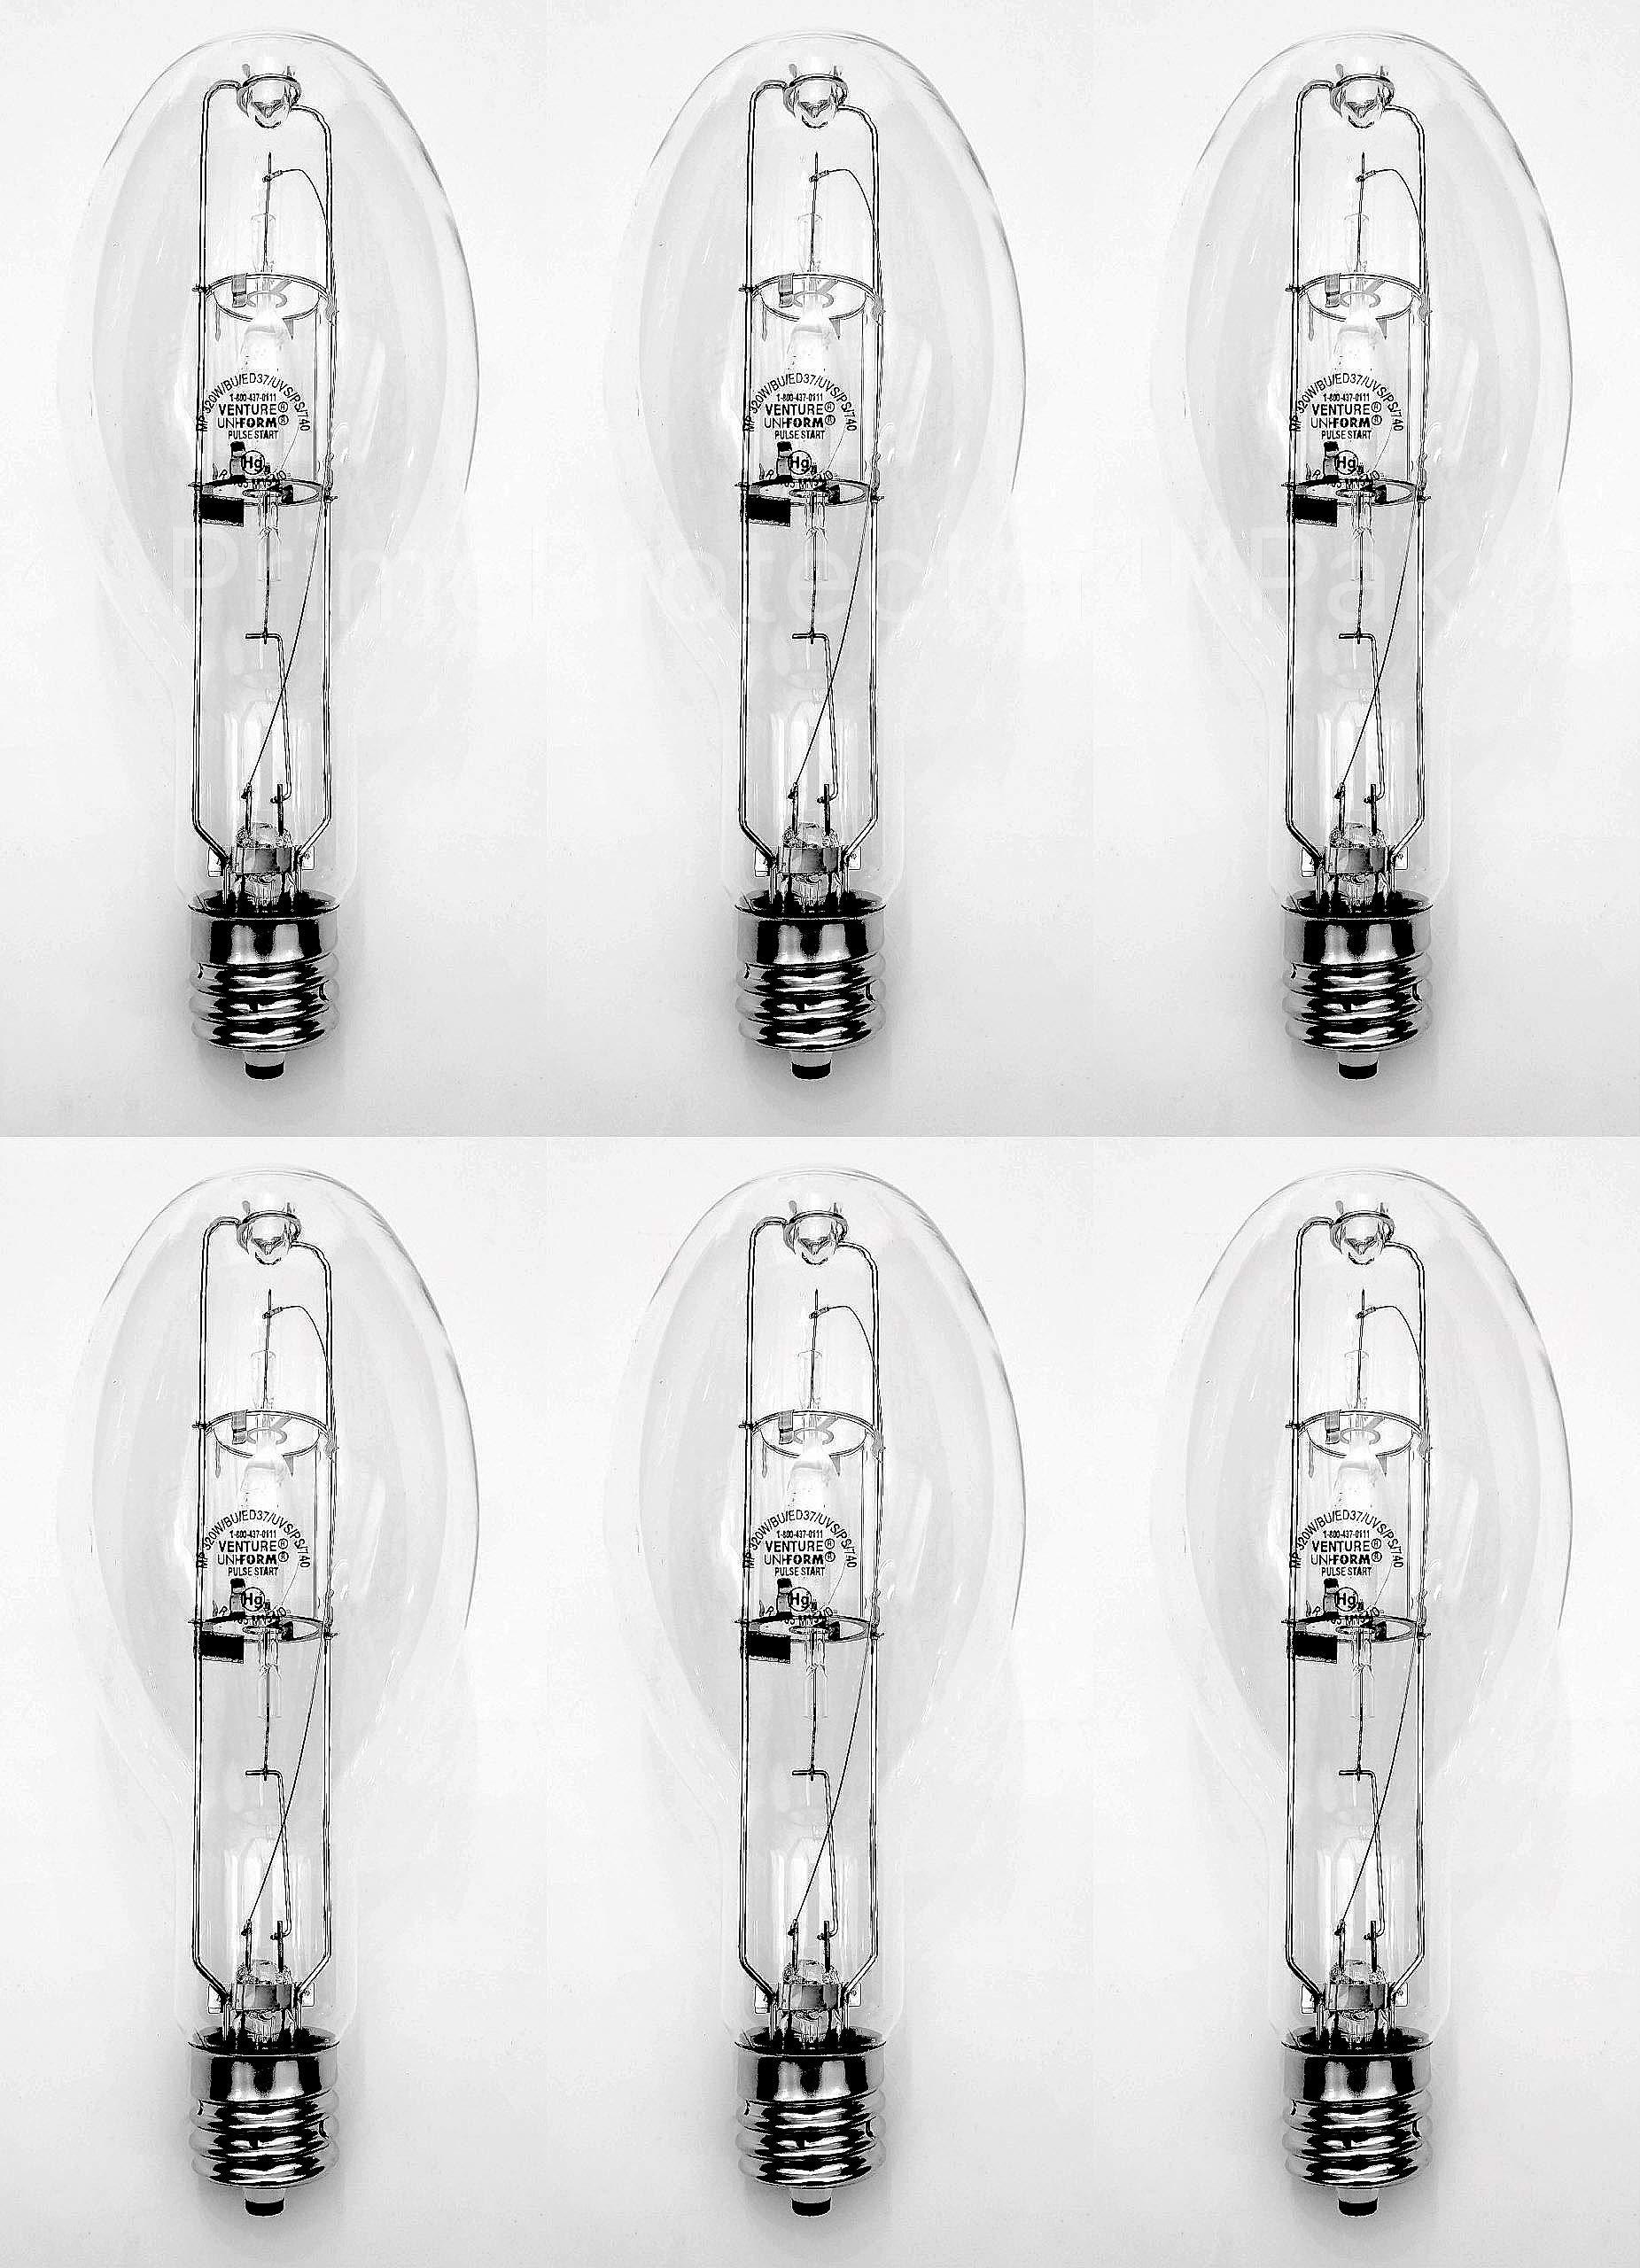 (6 Pack) GE CMH400/V/PA/O 400 Watt ED37 Pulse Start Metal Halide Lamp 400W Exclusionary Mogul EX39 Base MP400 Clear Bulb - ANSI M155 Replaces MP400/BU/PS MP400/BU MP400/ED37/PS/BU MS400/ED37/PS/U/4K